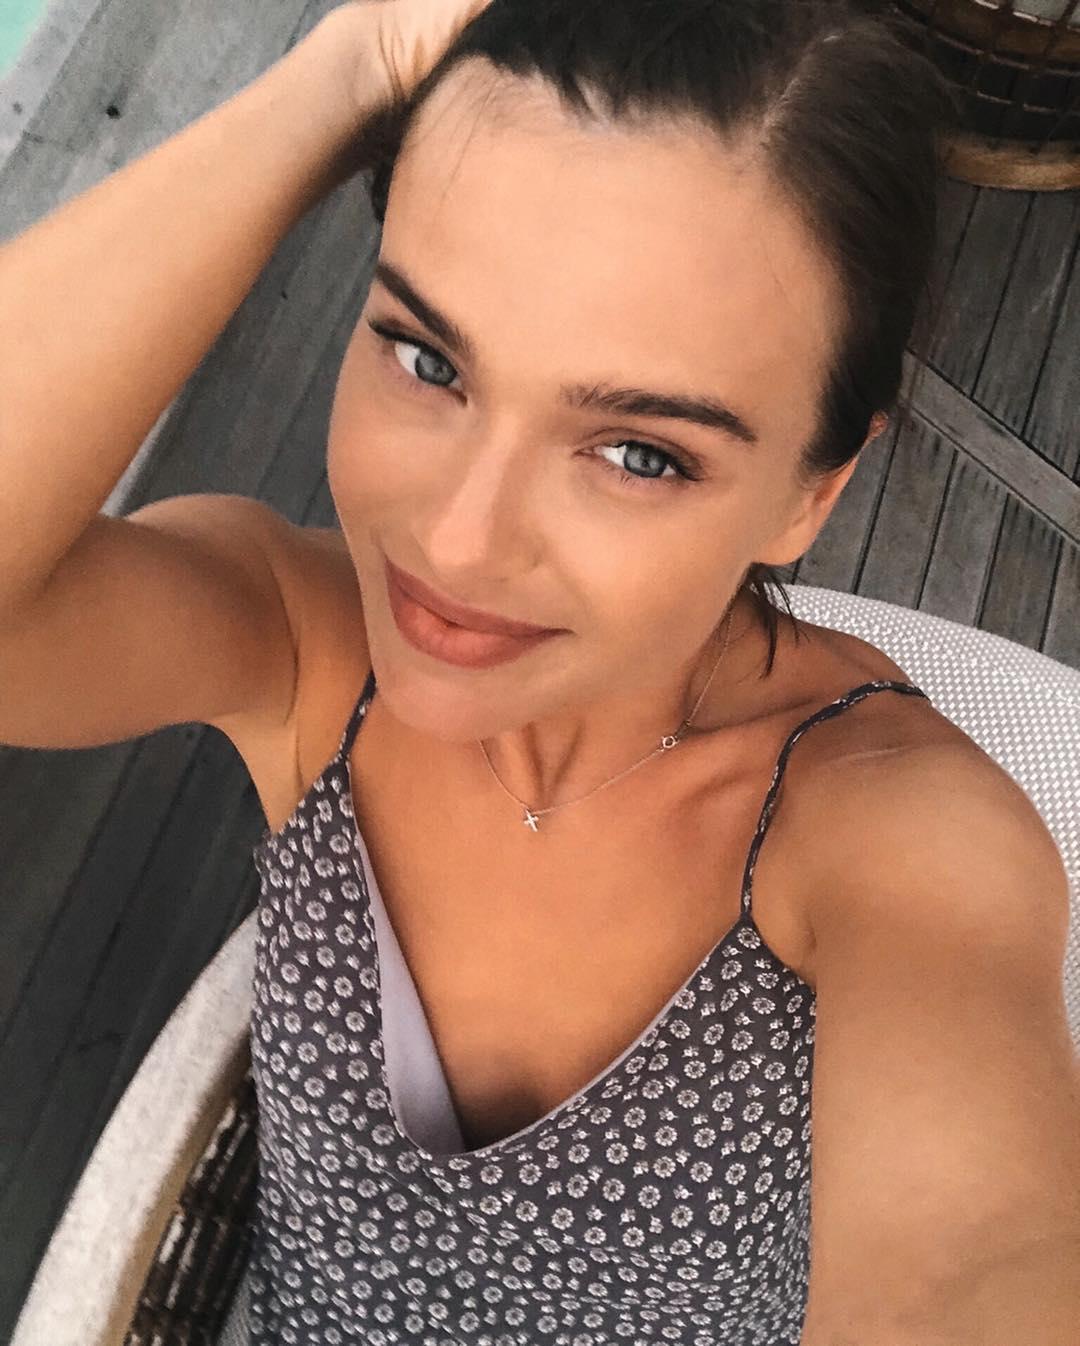 Елена Темникова: Сейчас два месяца тура и срочно снова улечу на свой любимый остров @milaidhoo